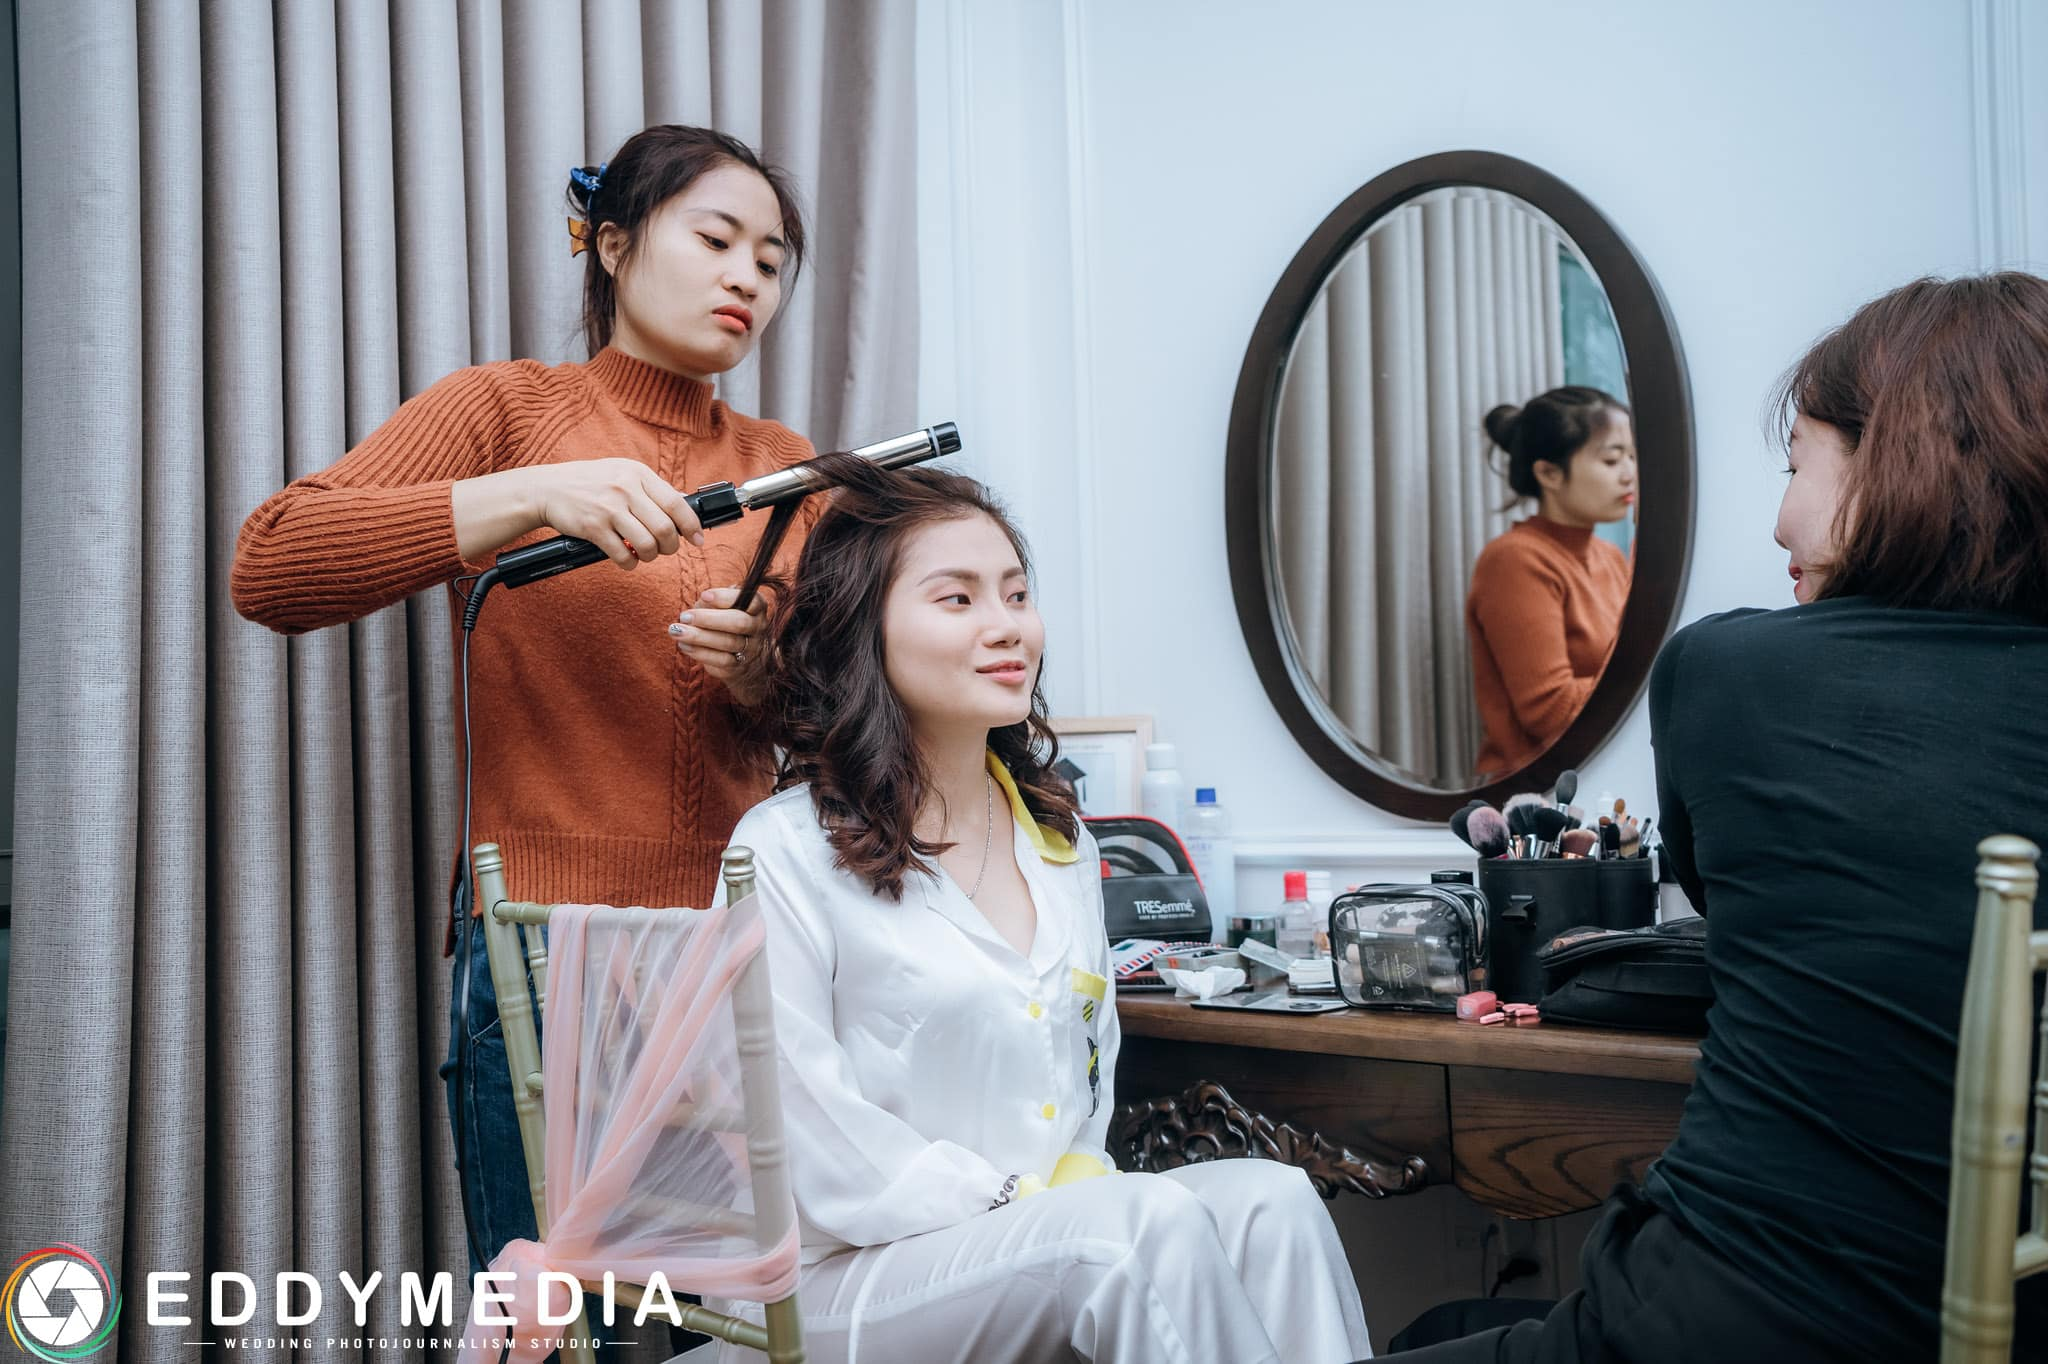 Phongsucuoi SyPhuc HaPhuong EddyMedia 10 chuẩn bị đám cưới trong 3 tháng